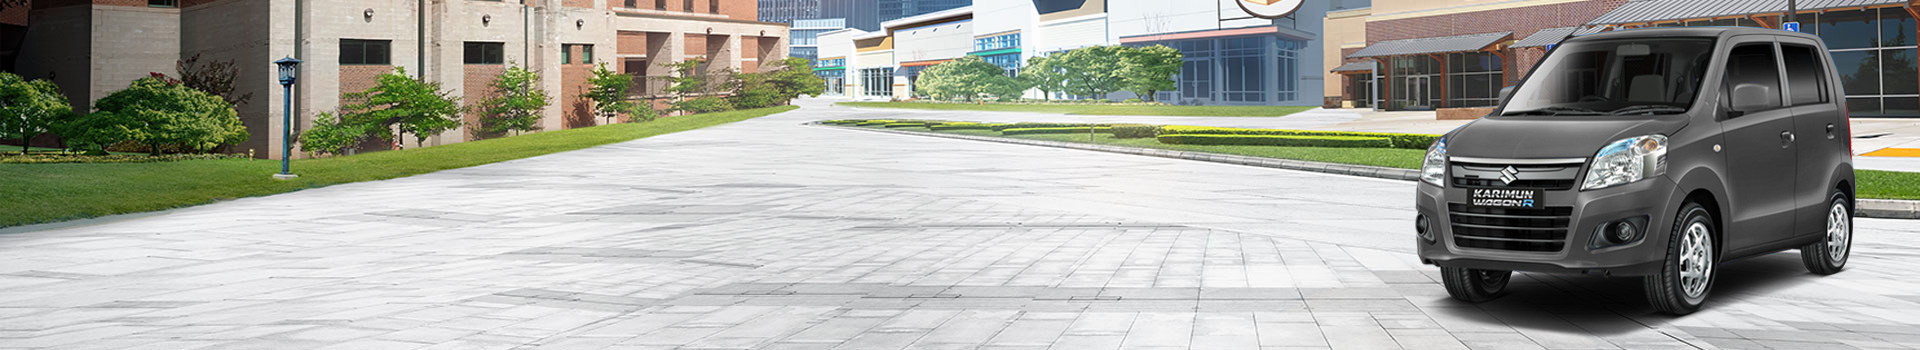 Spesifikasi Dan Harga Suzuki Karimun Wagon R